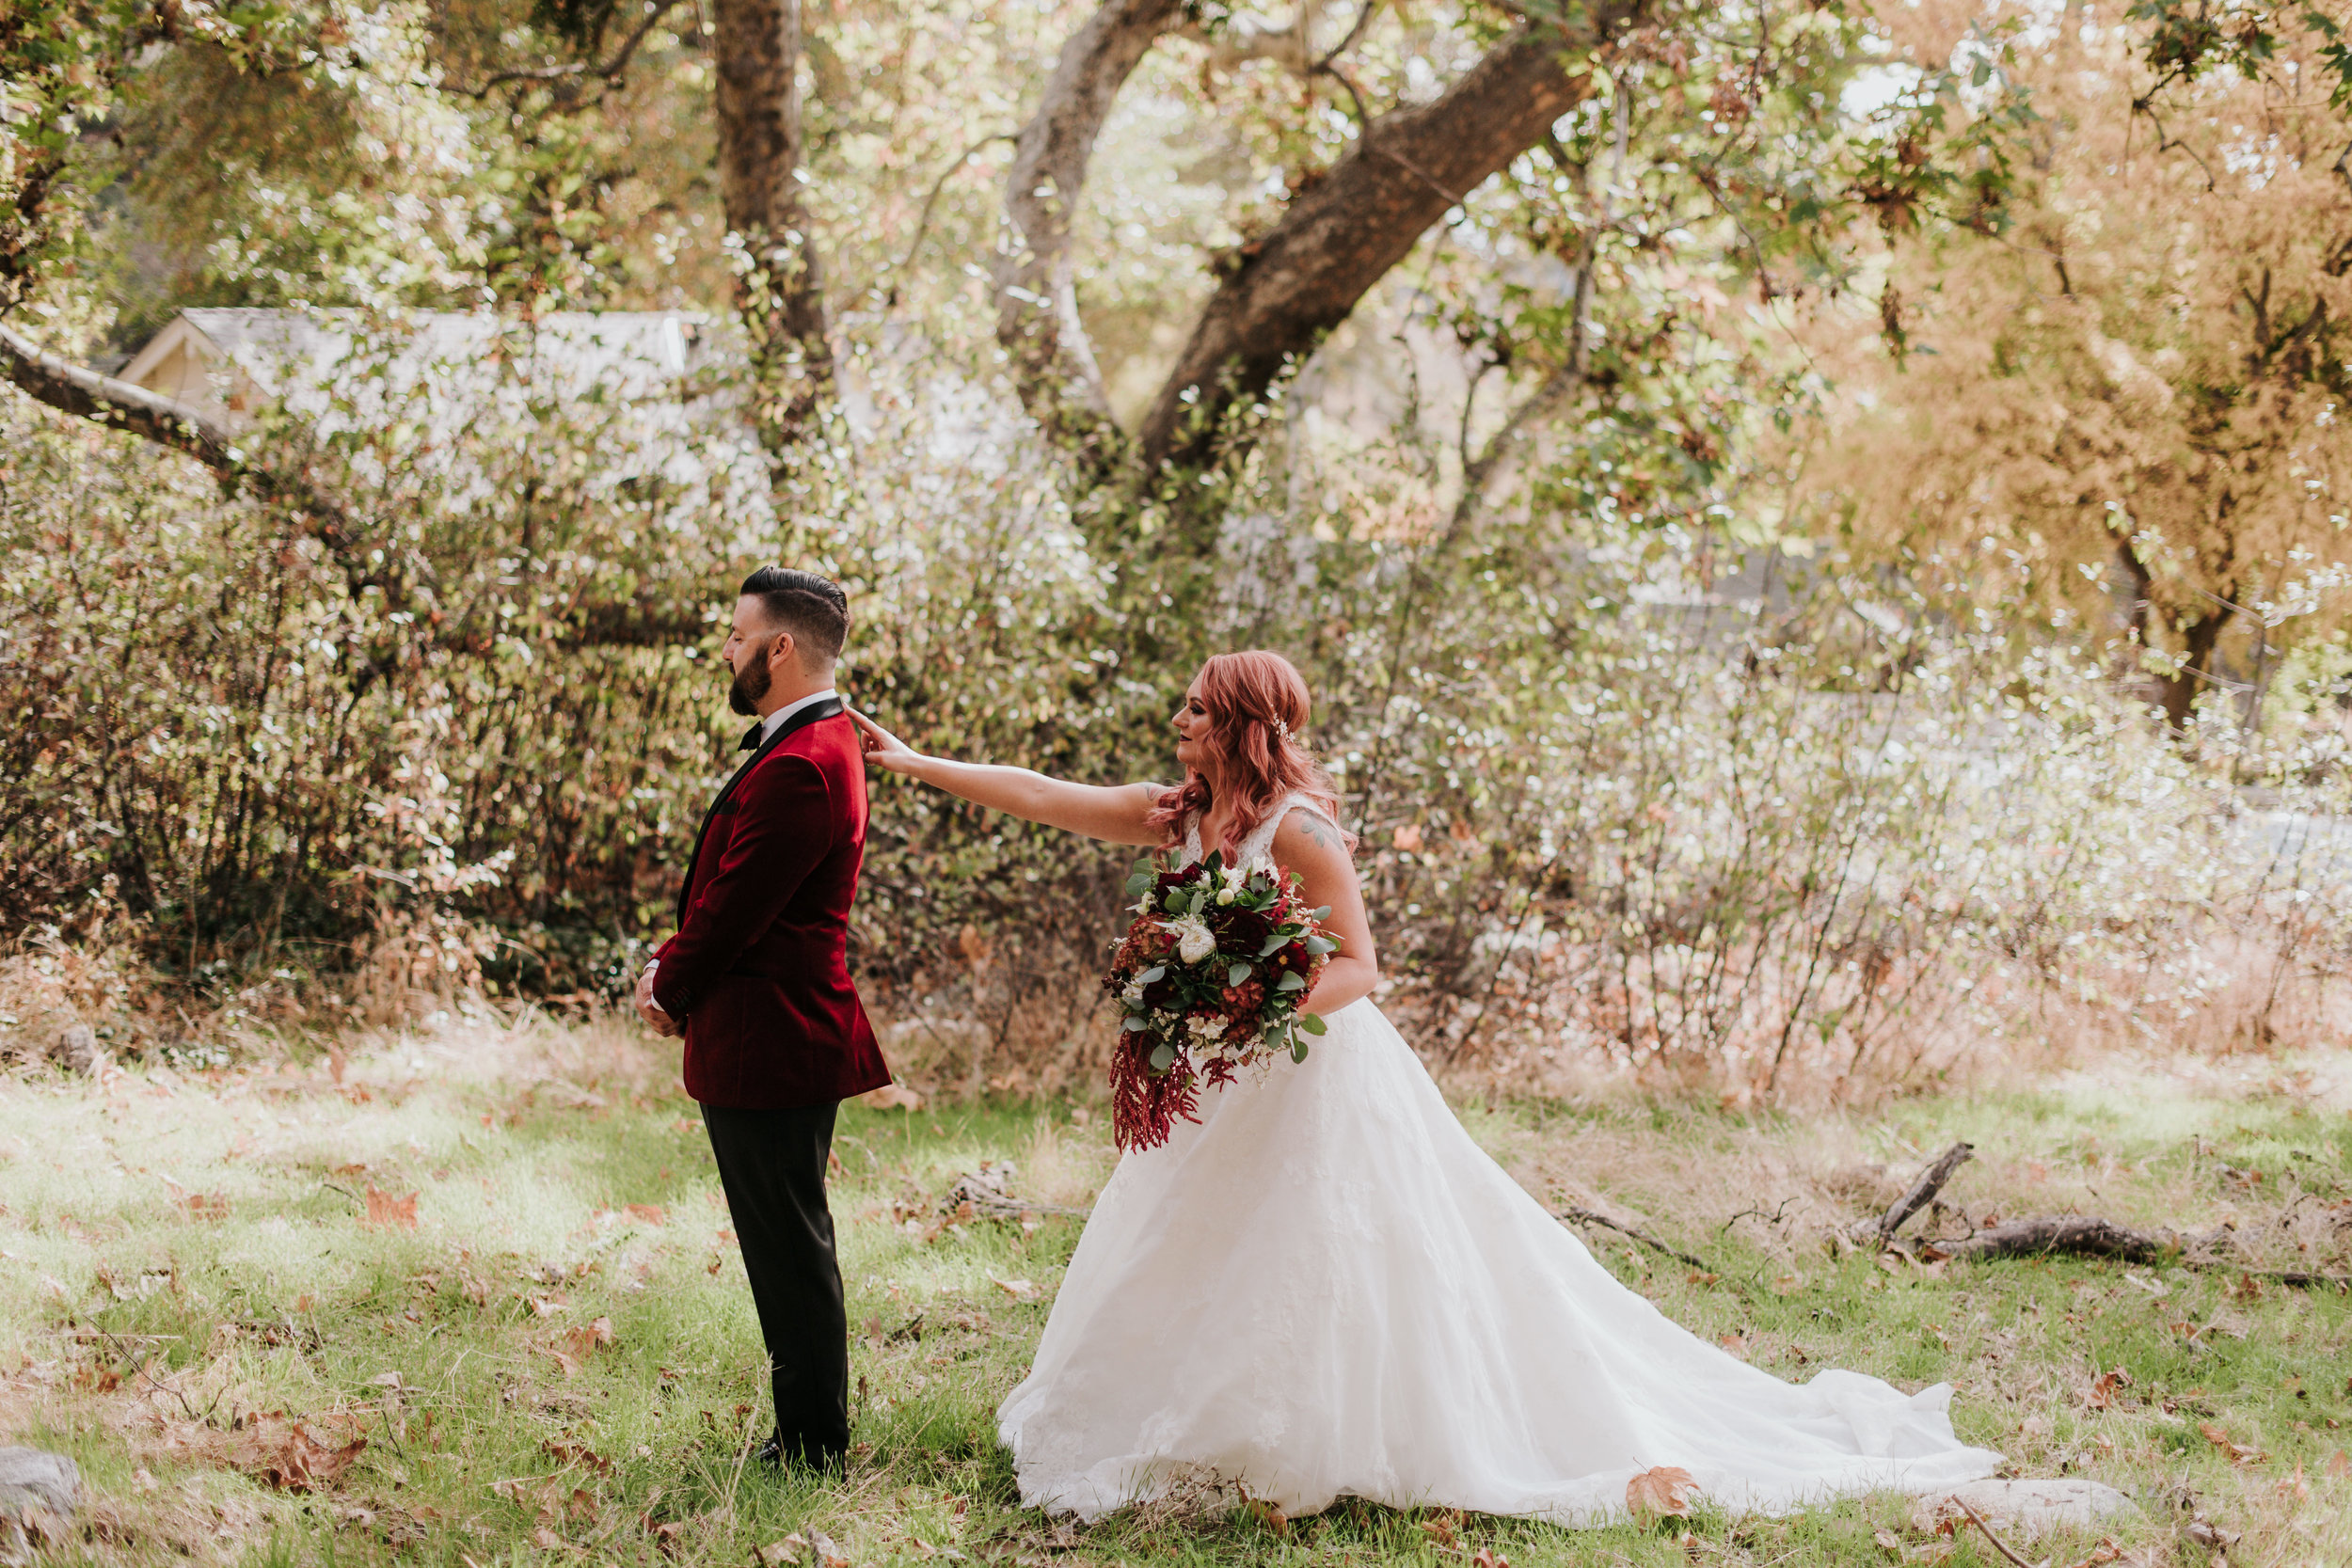 2018-11-04 Maresa and Nick - Married - Oak Glen-190.jpg